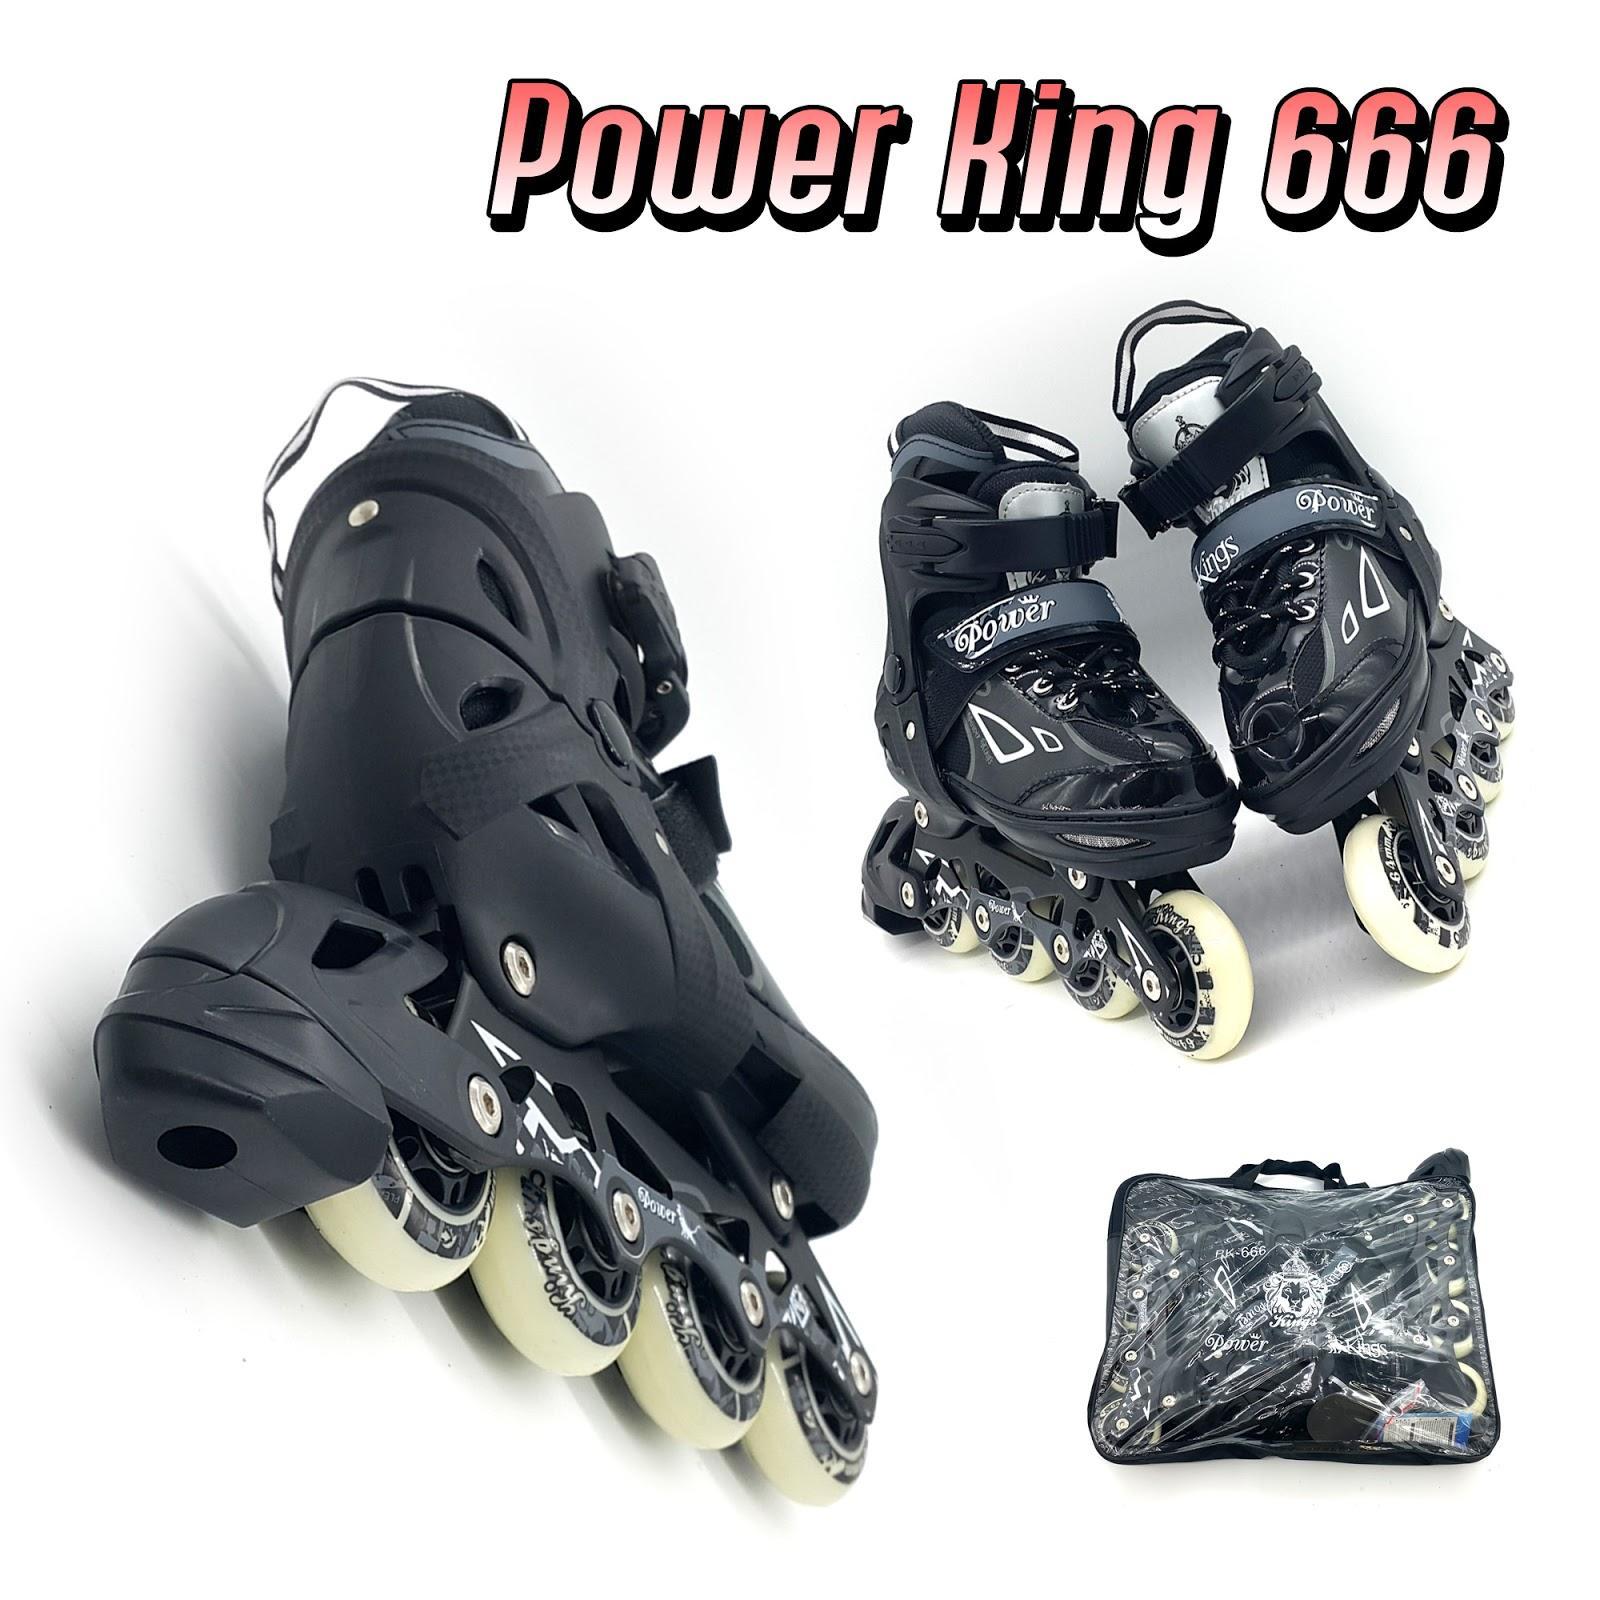 Sepatu Roda Inline Skate Power King 666 Roda Karet Asli a500fd1df9